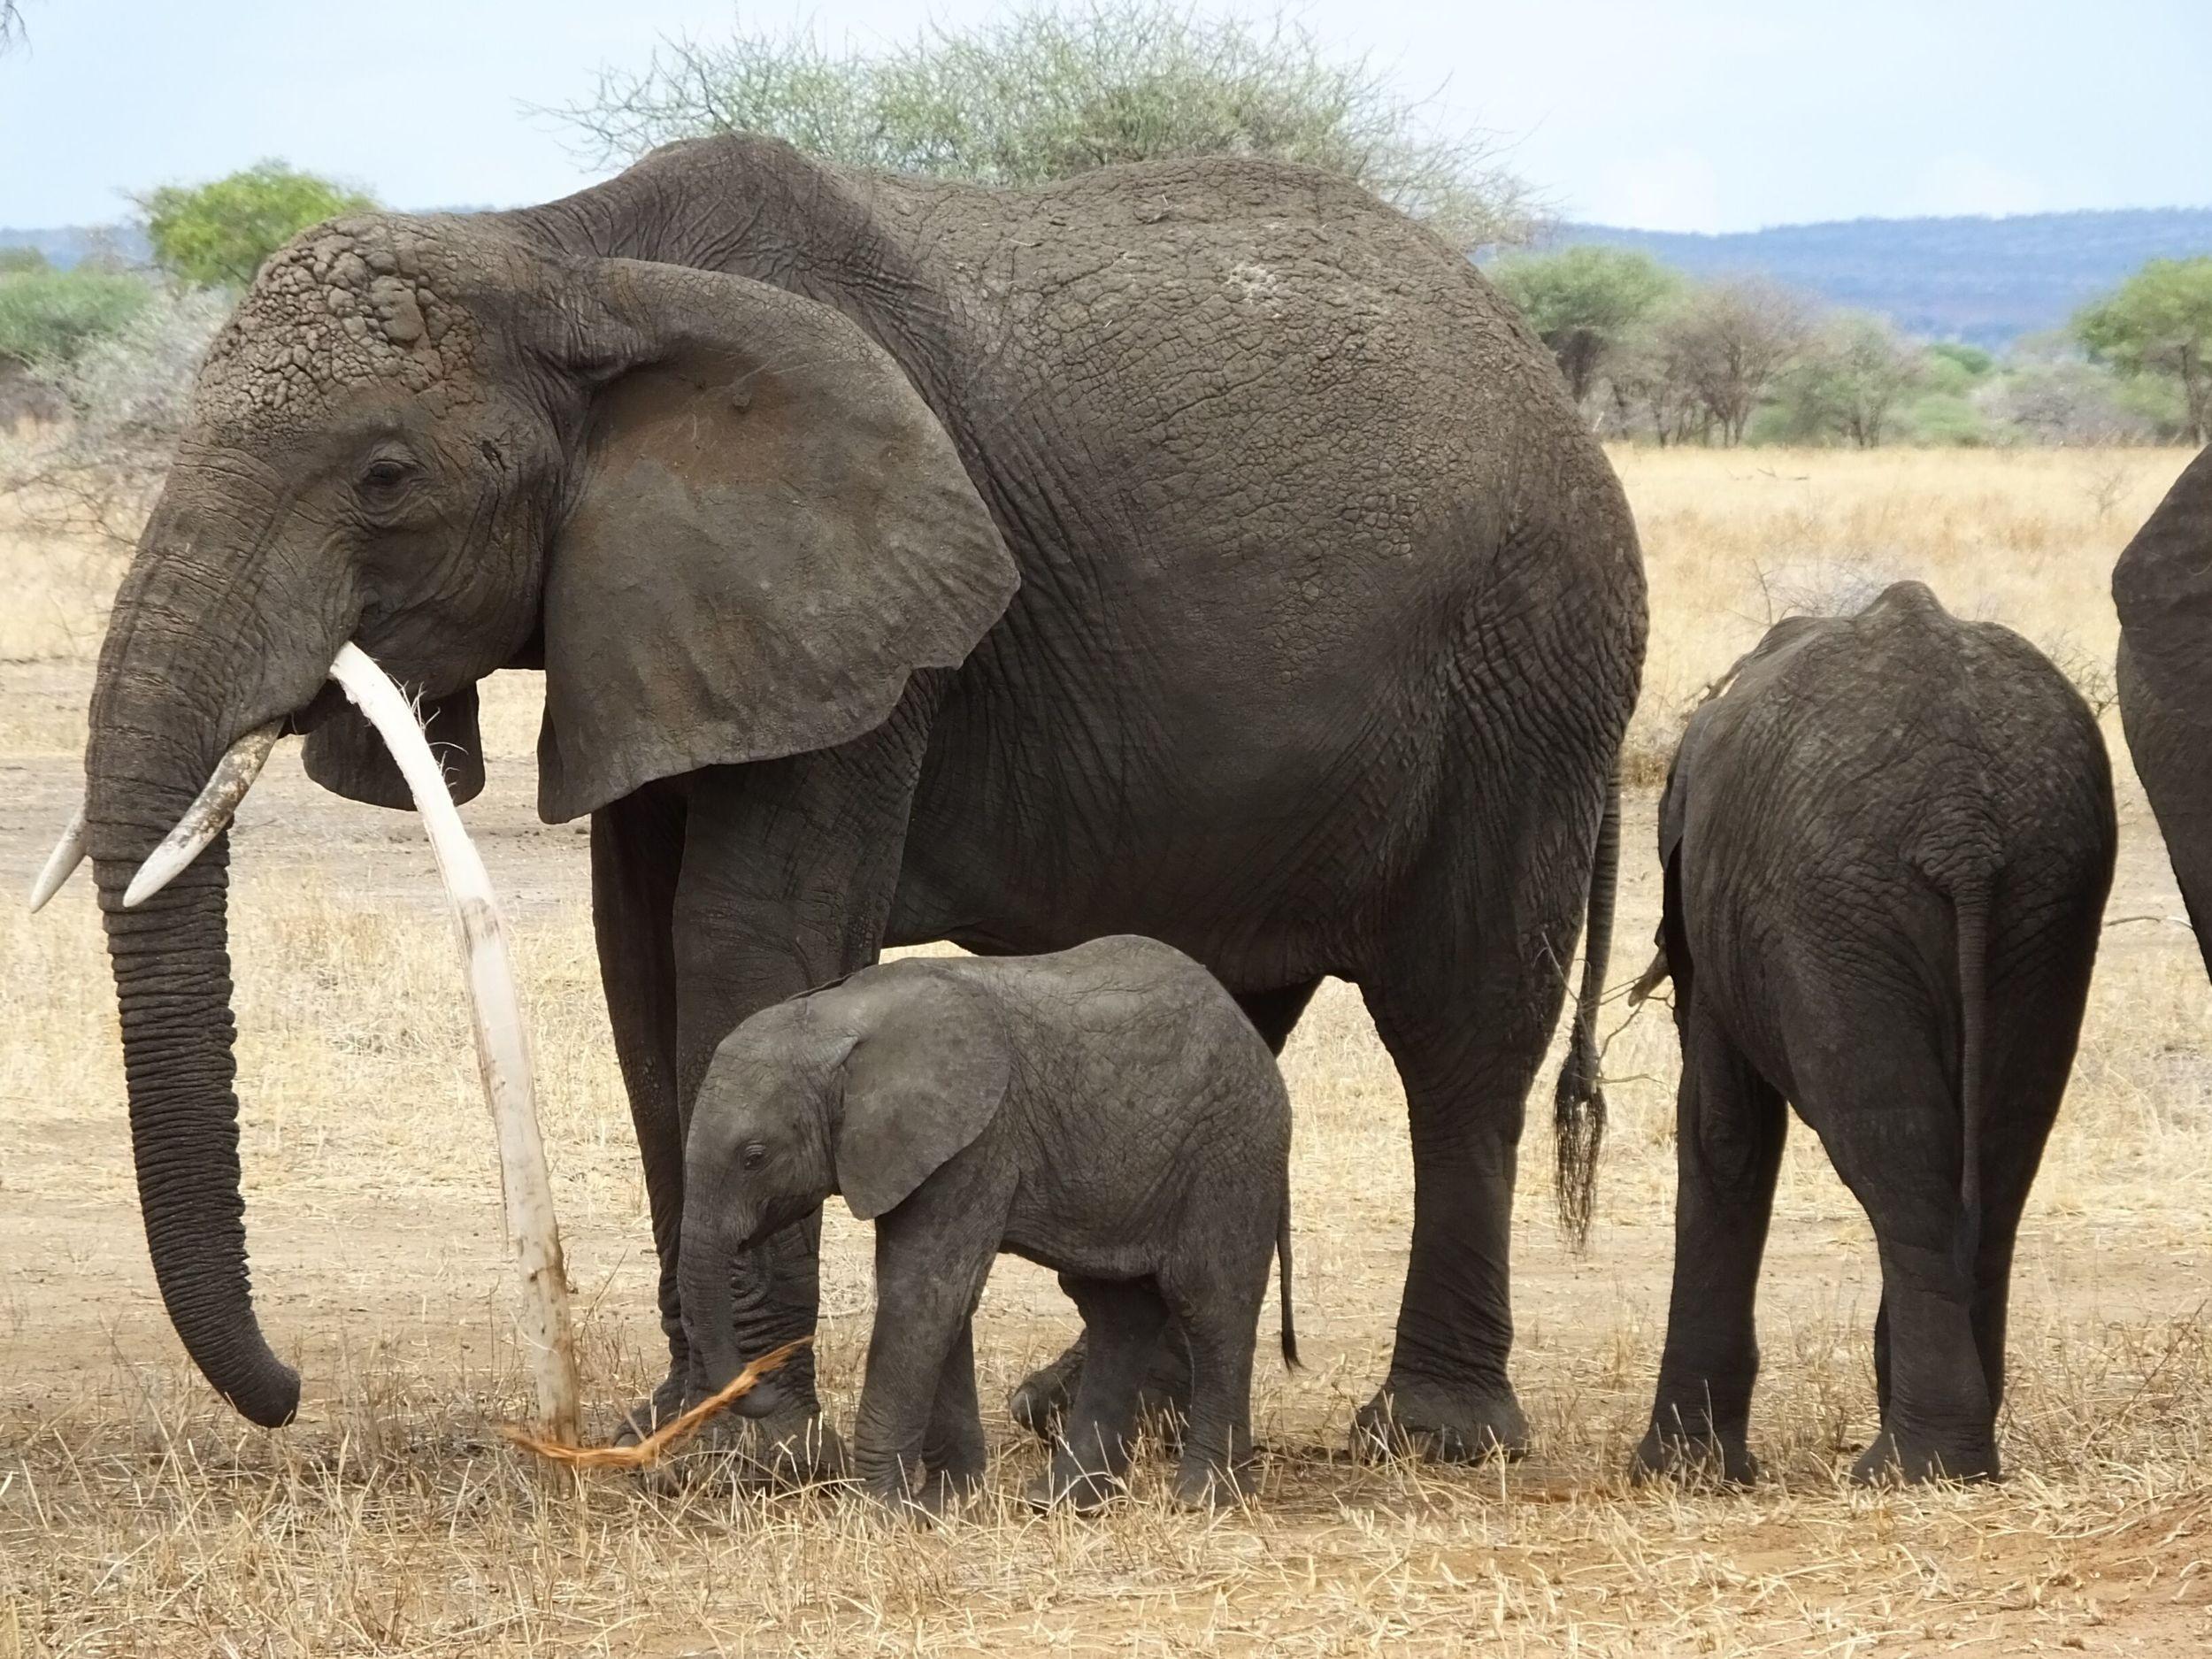 Elephants in Tarangire National Park.